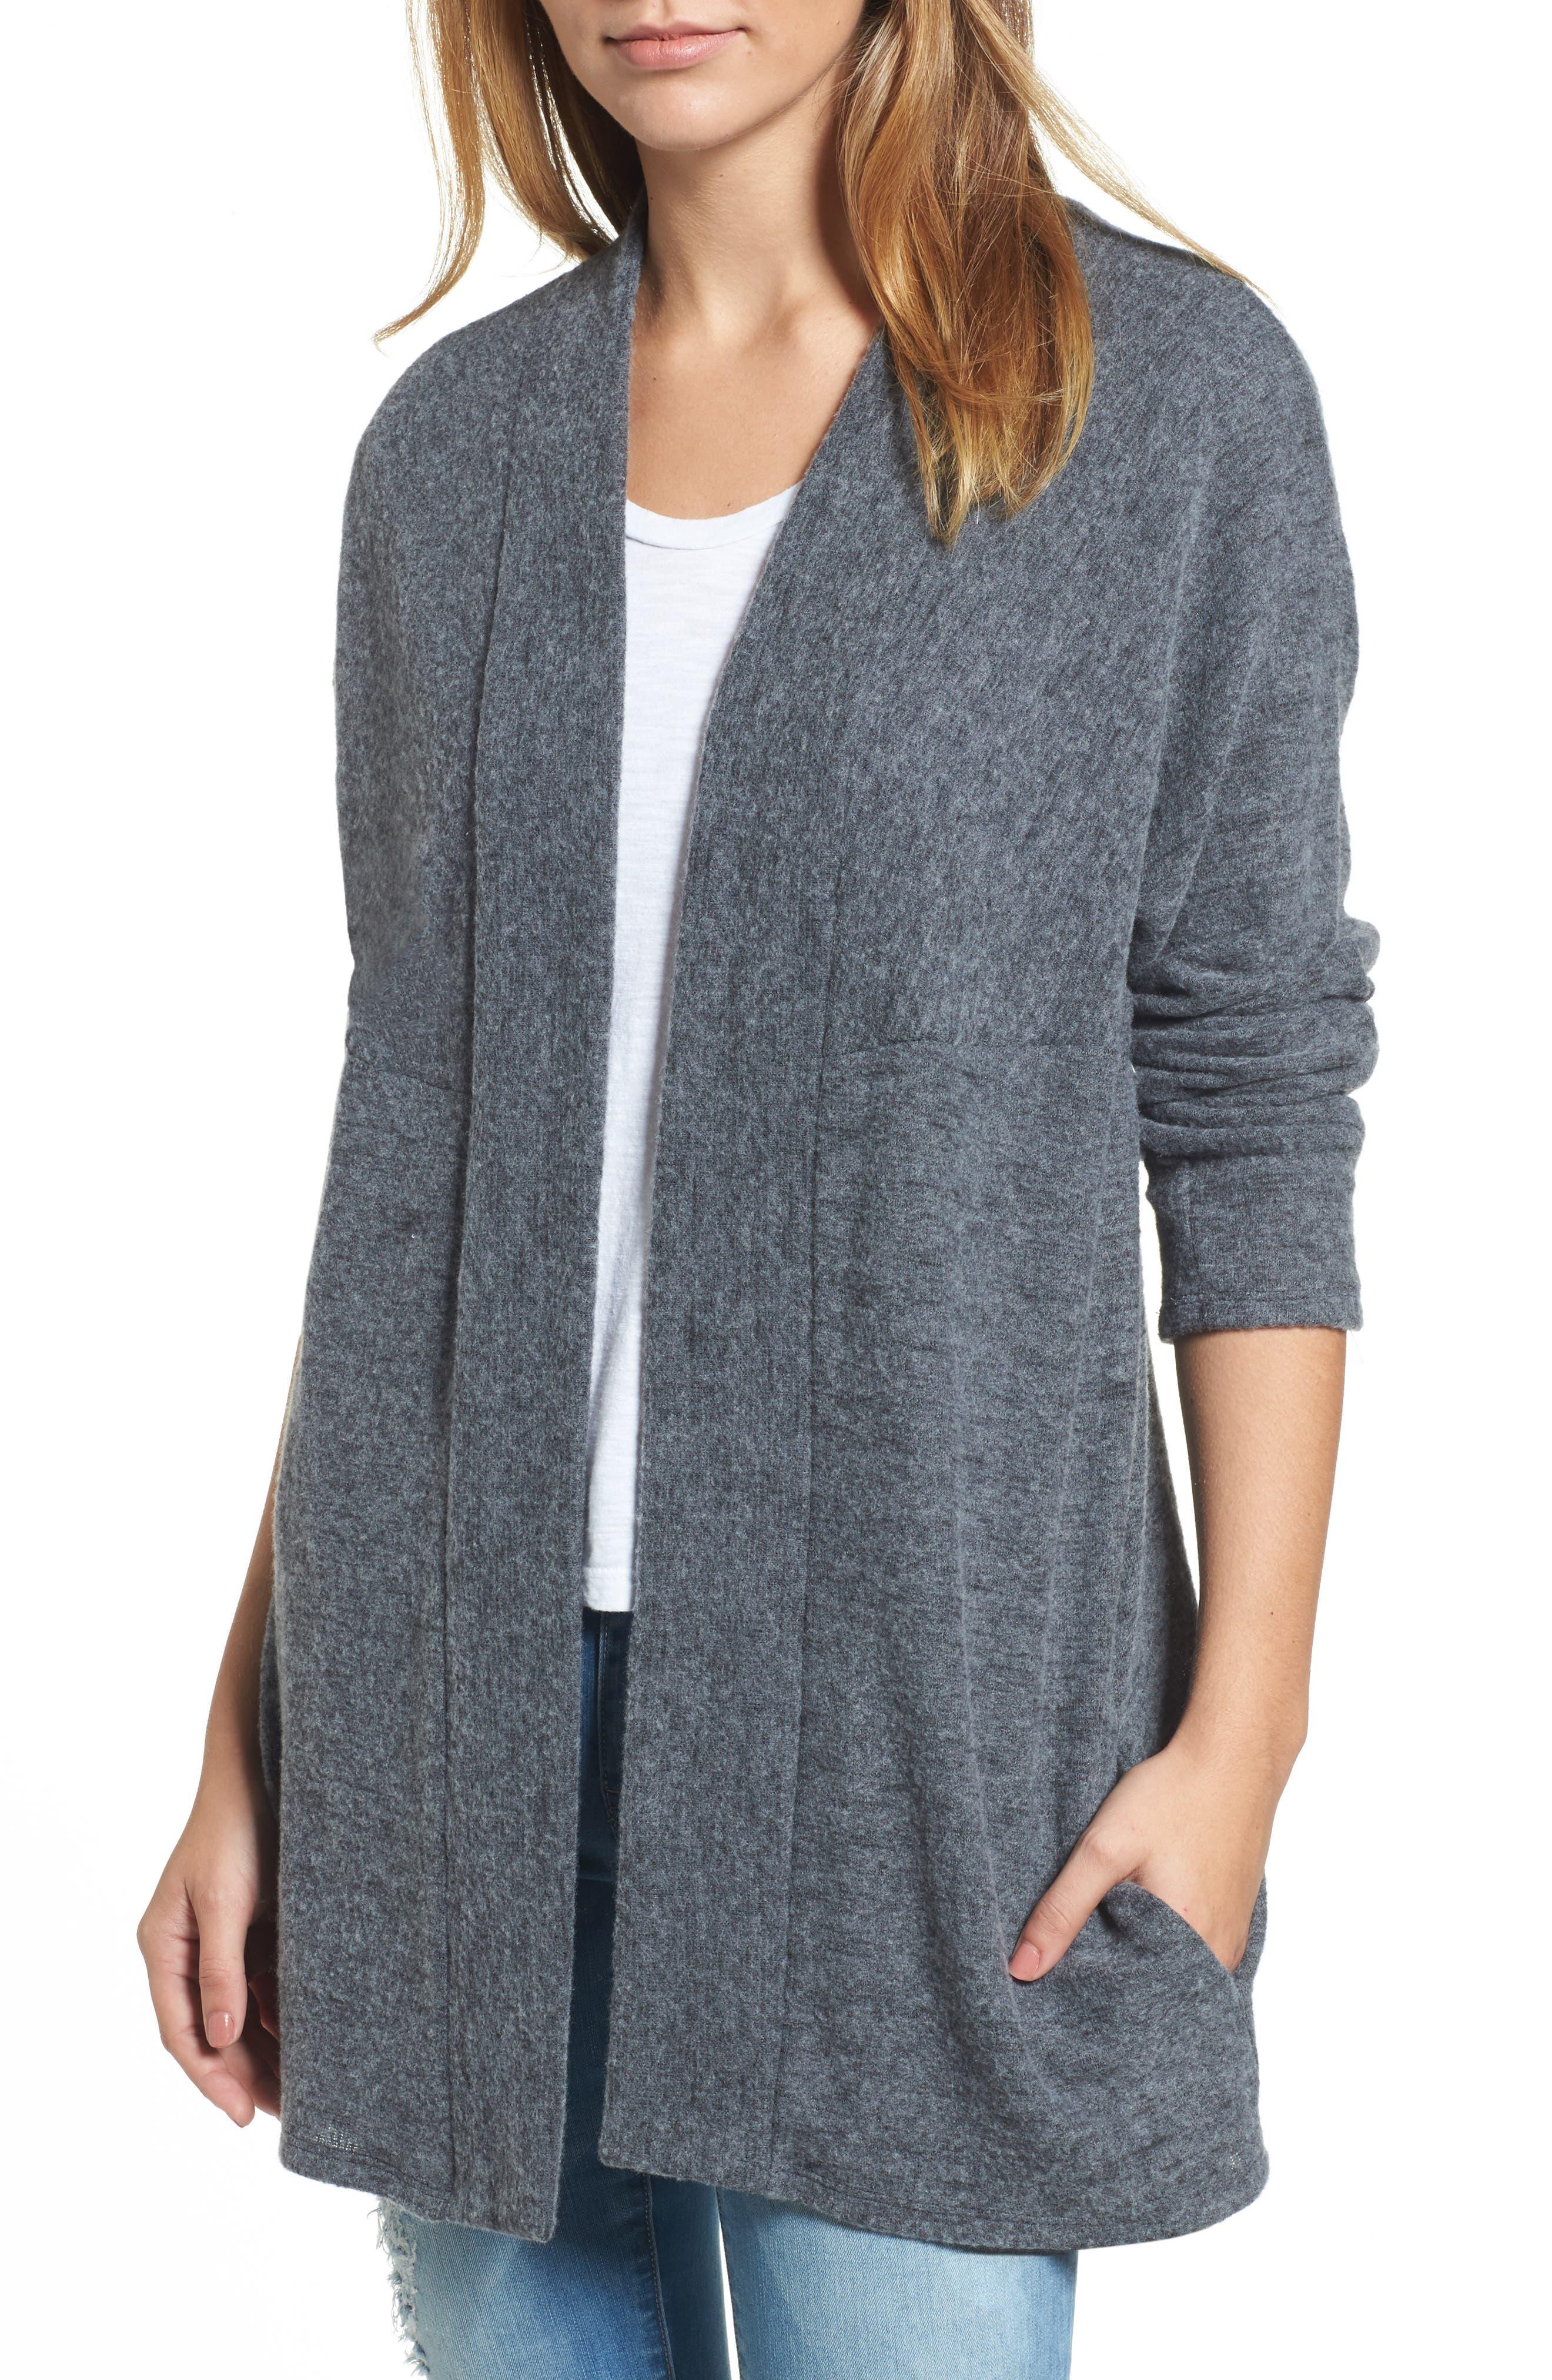 Caslon Open Knit Cardigan,                         Main,                         color,